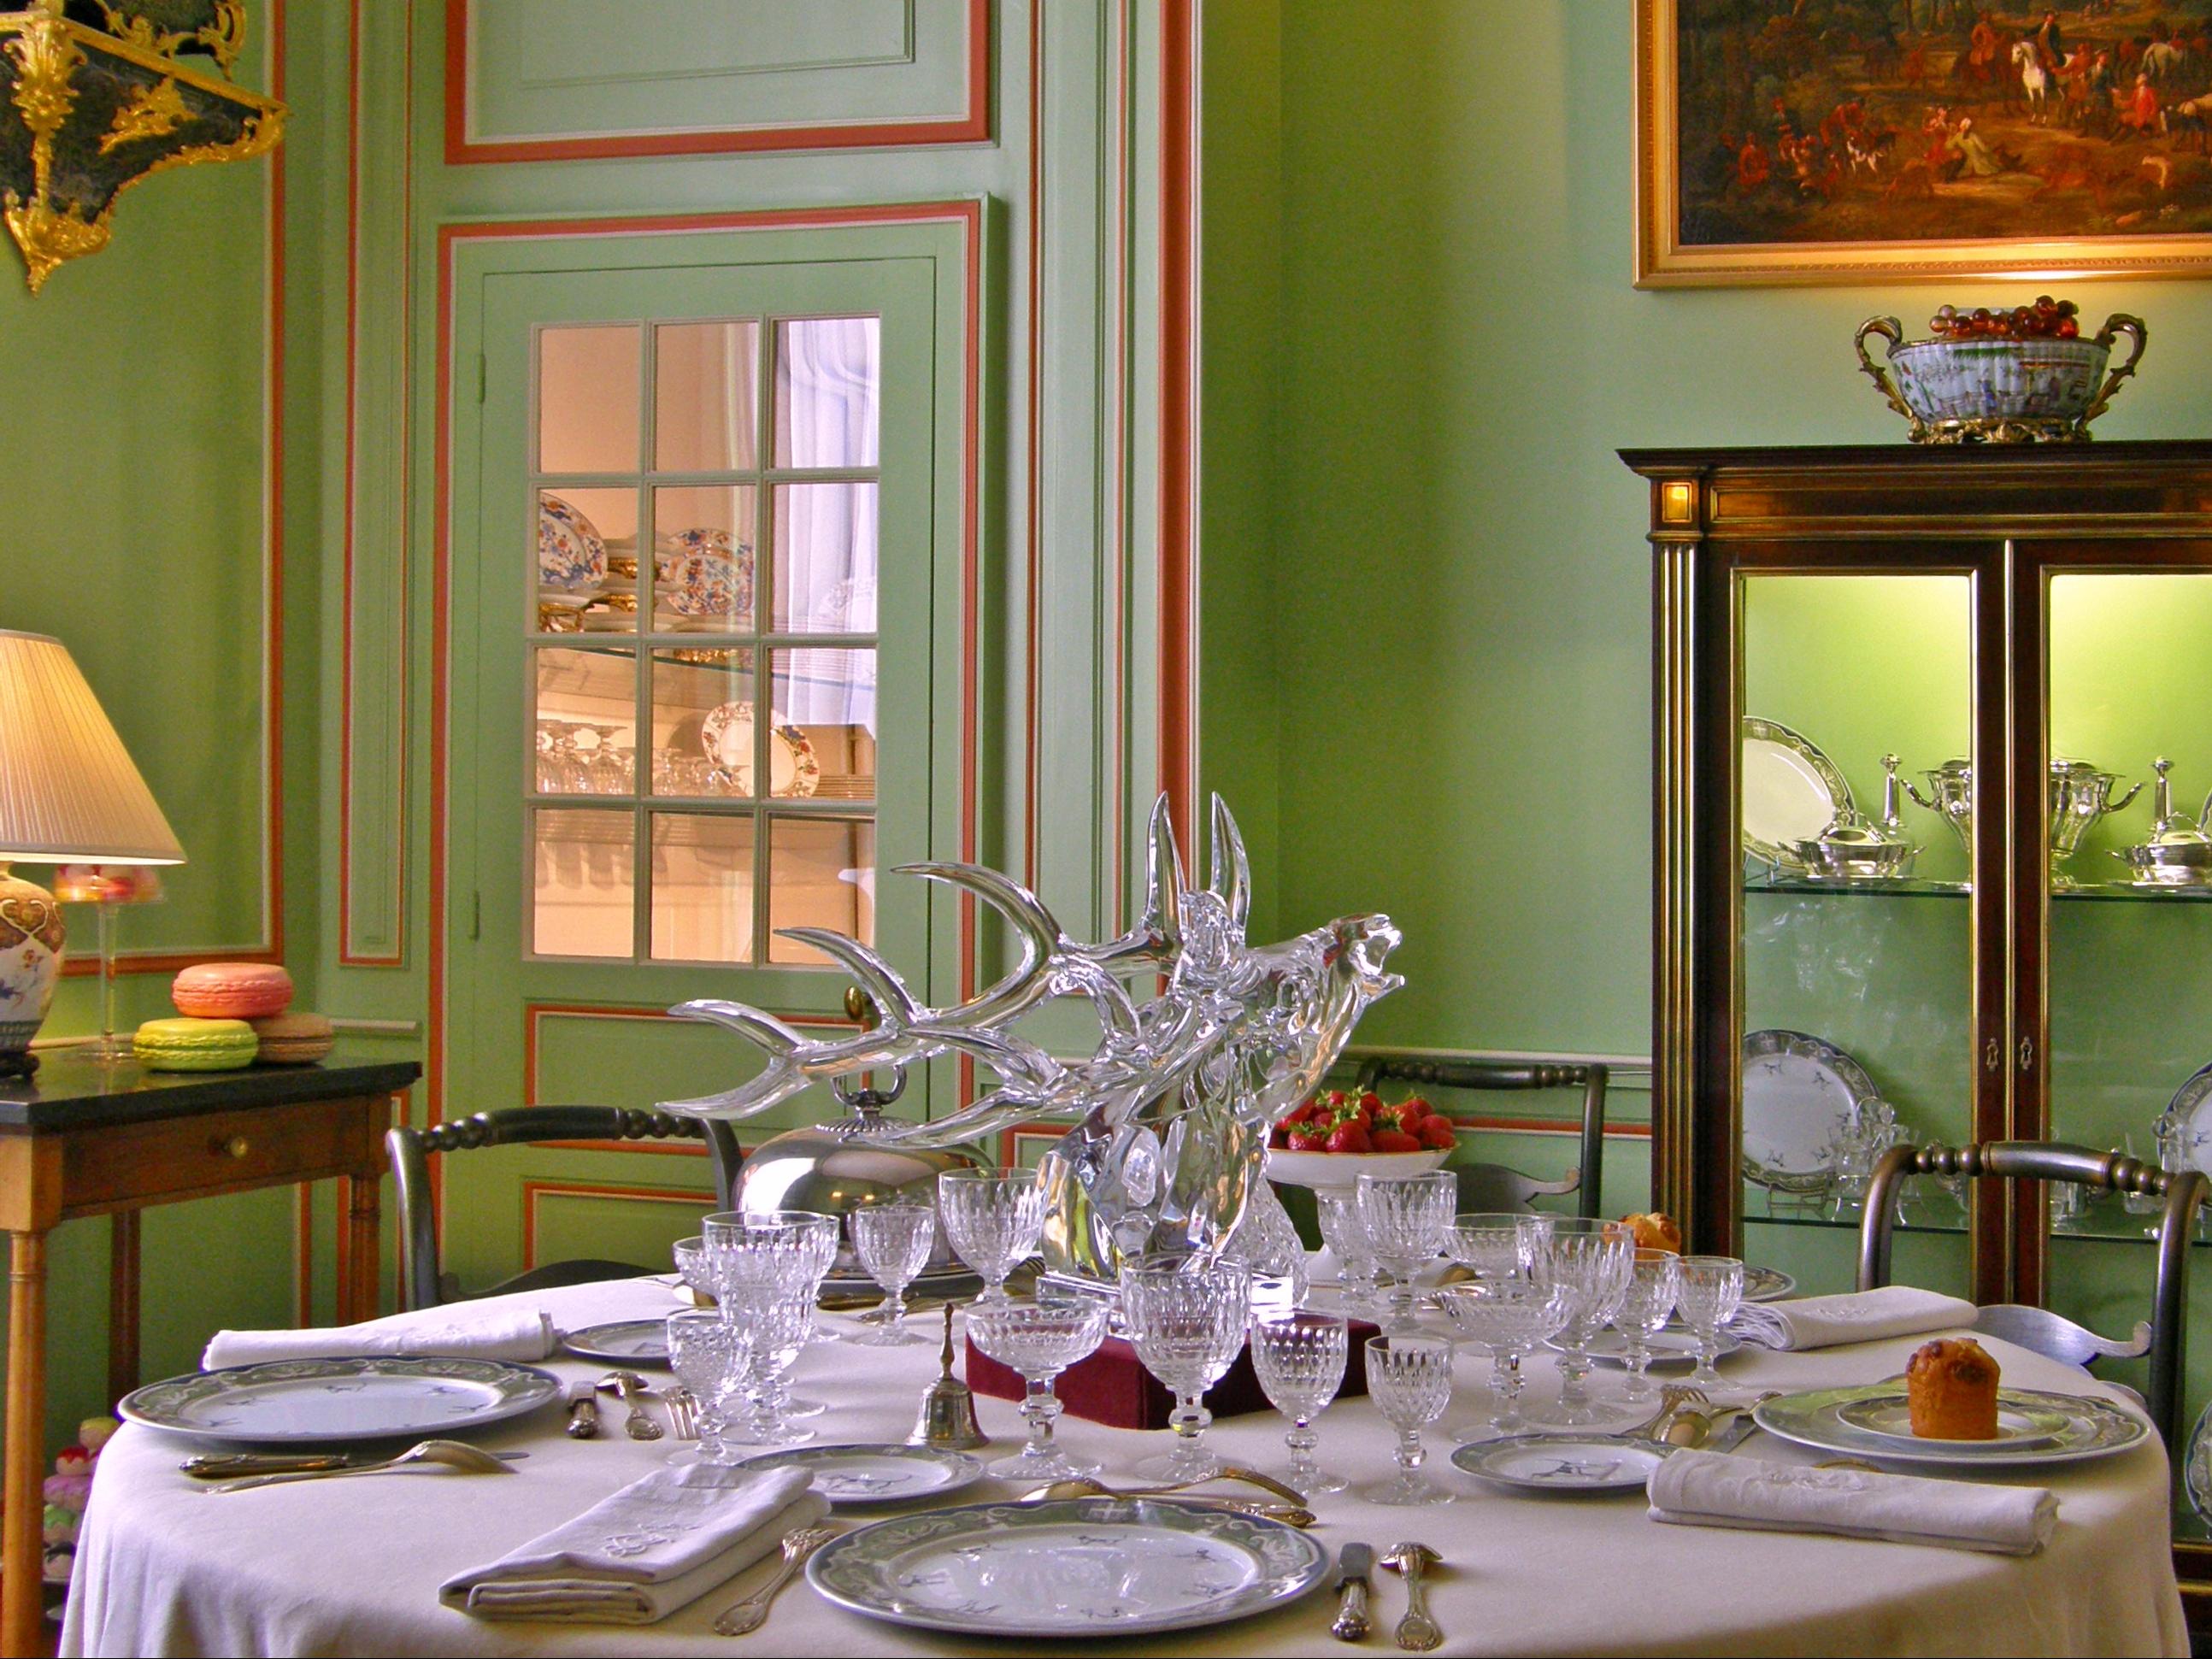 Petite table salle a manger maison design for Petite salle a manger design